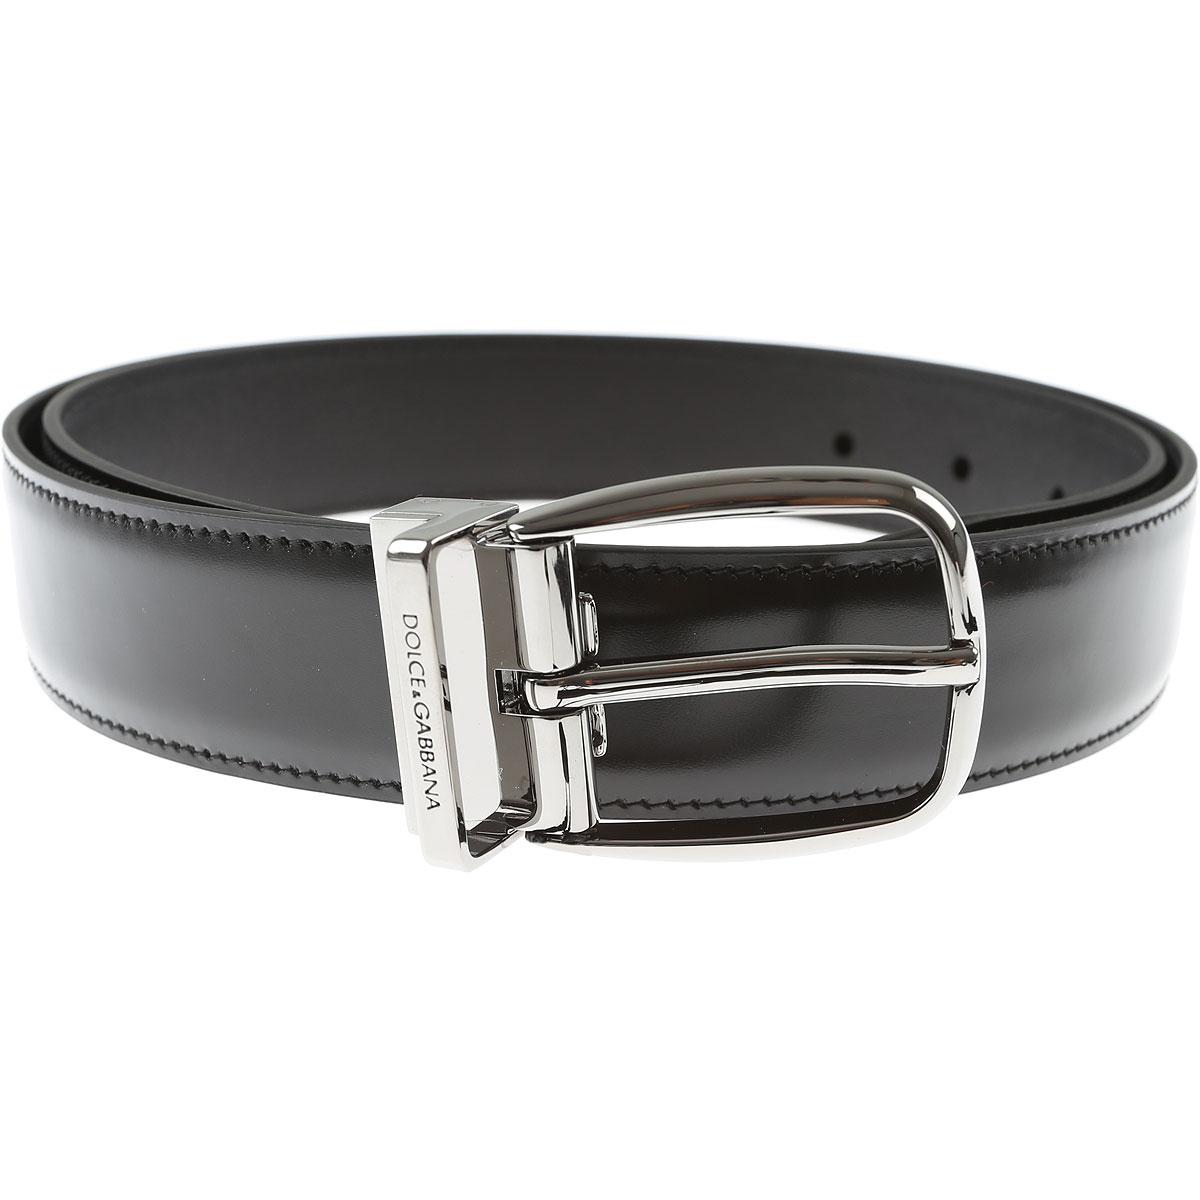 Dolce & Gabbana Mens Belts, Black, Leather, 2017, 40 42 44 46